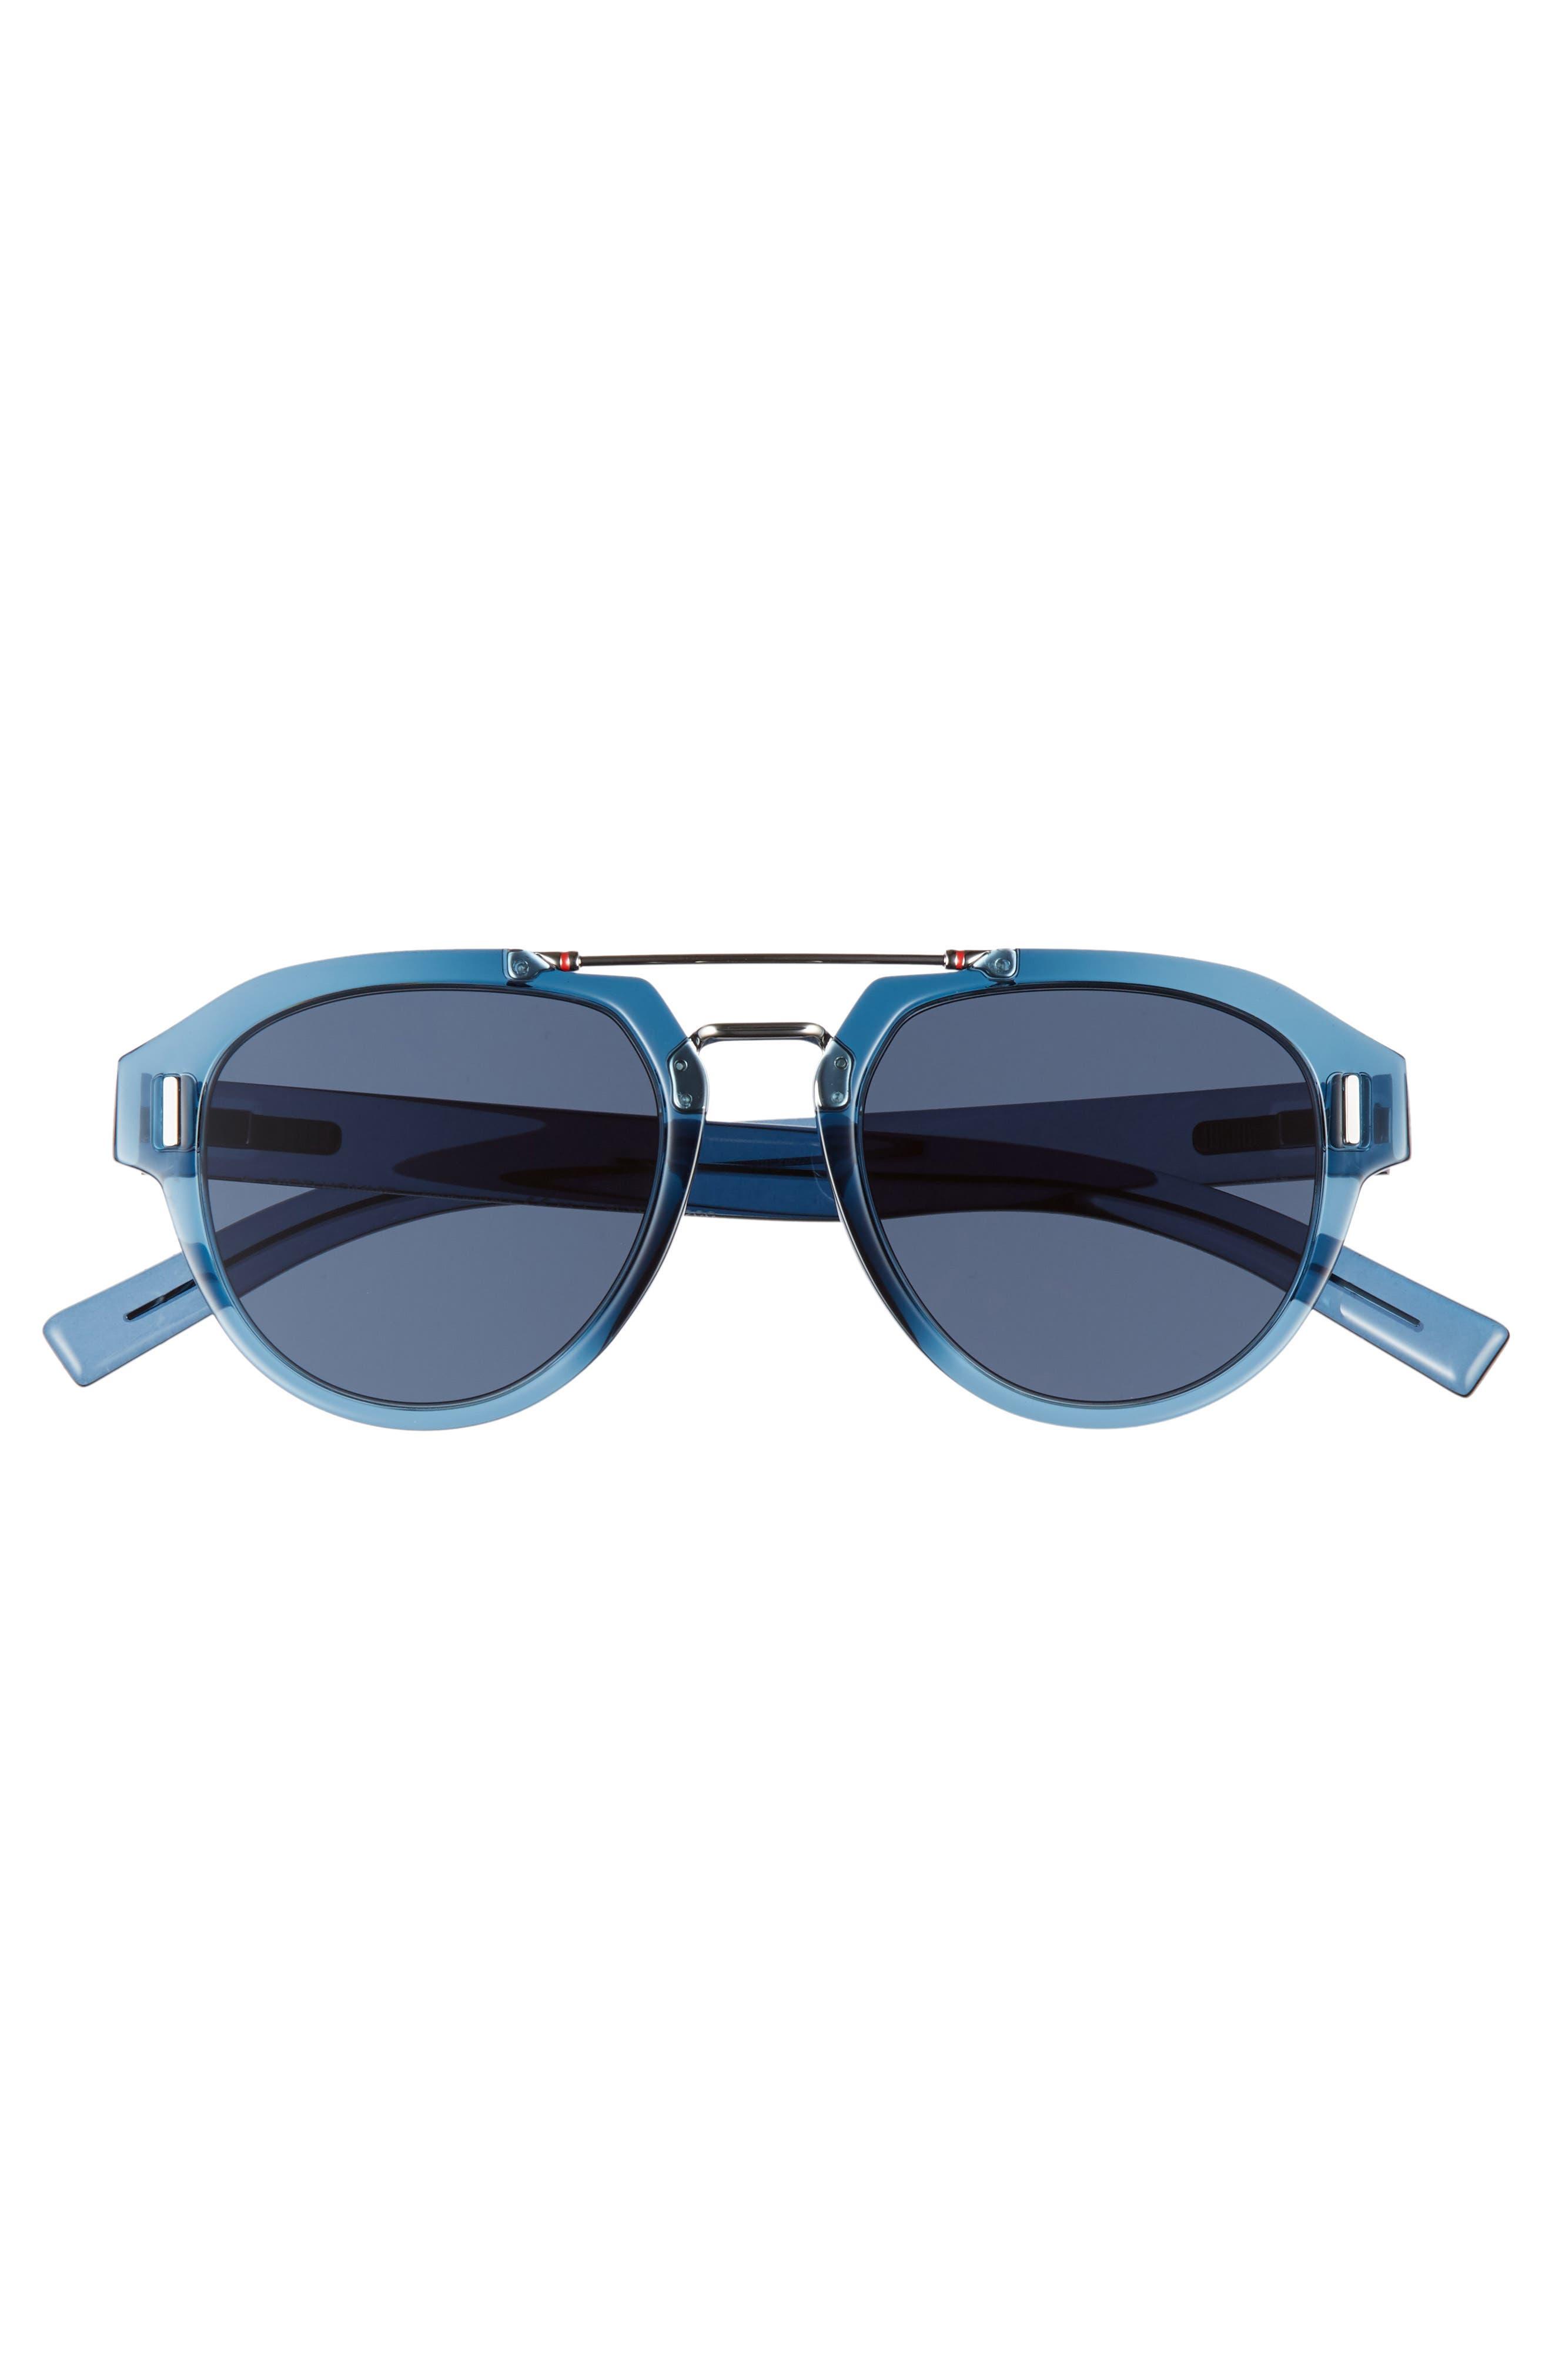 41101f4d009e Men s Dior Homme Sunglasses   Eyeglasses